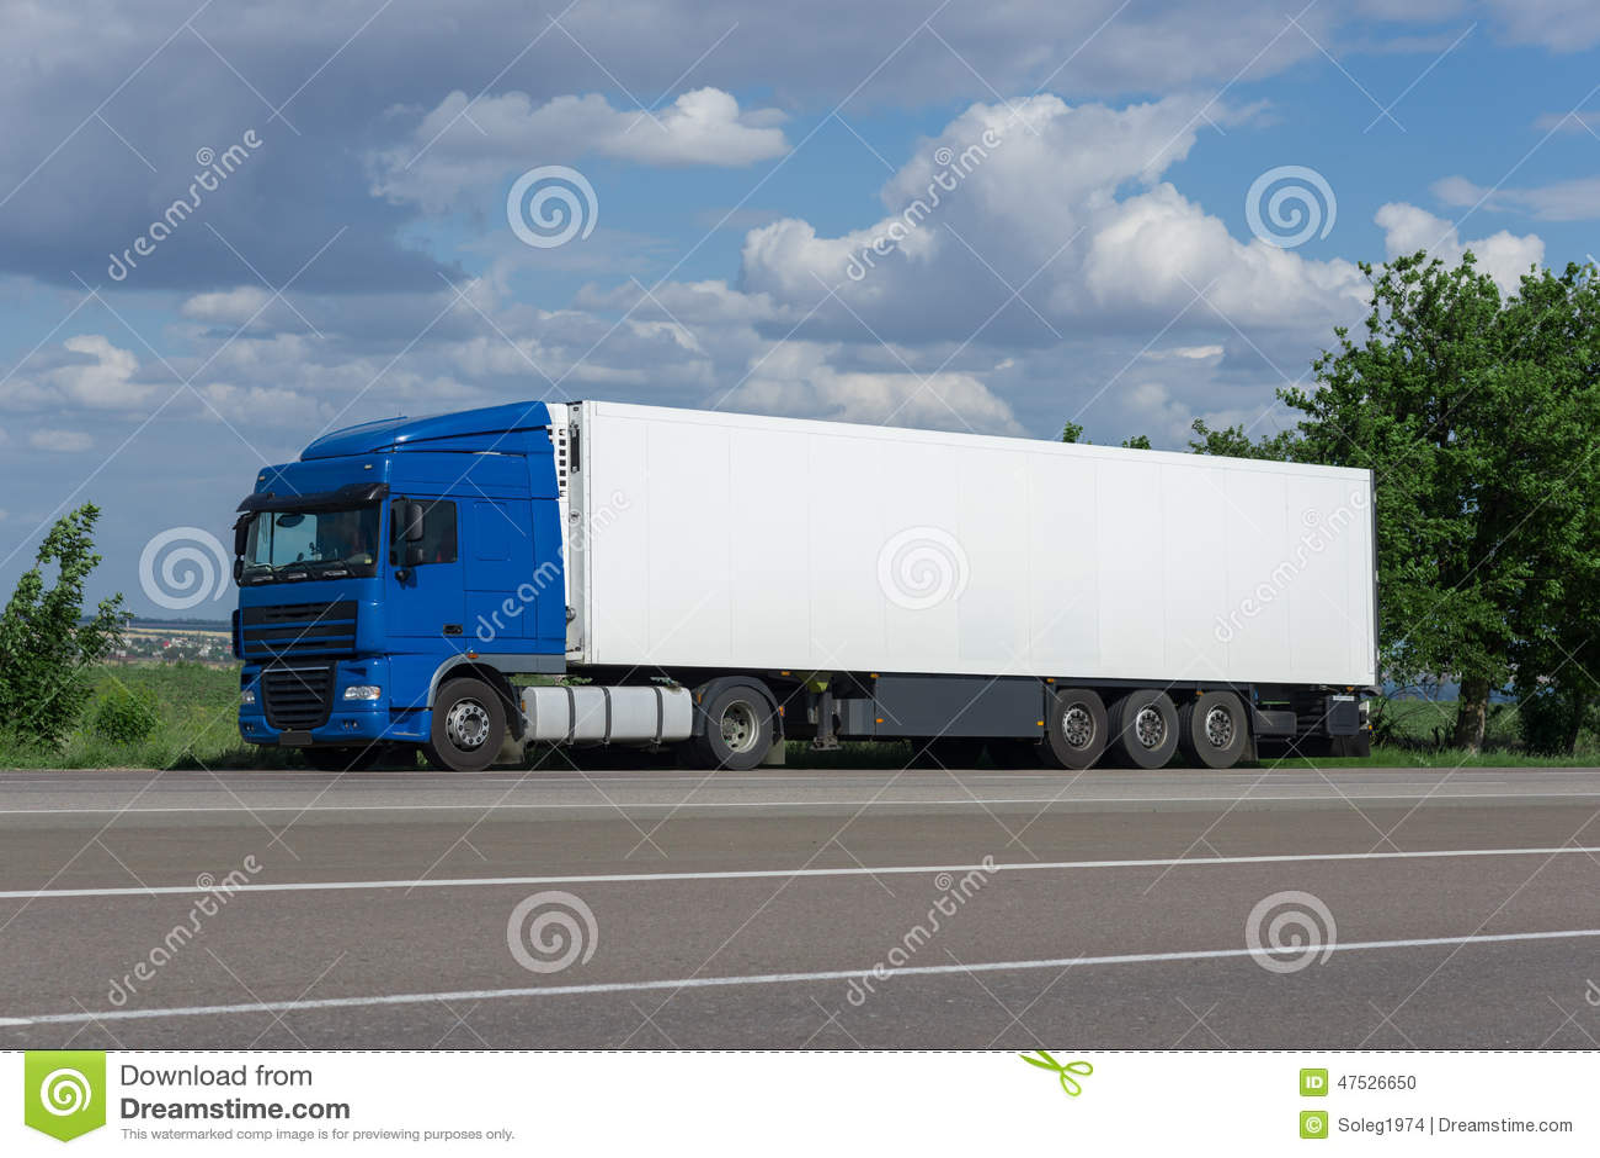 Cargo Truck On Road Stock Photo - Image: 47526650